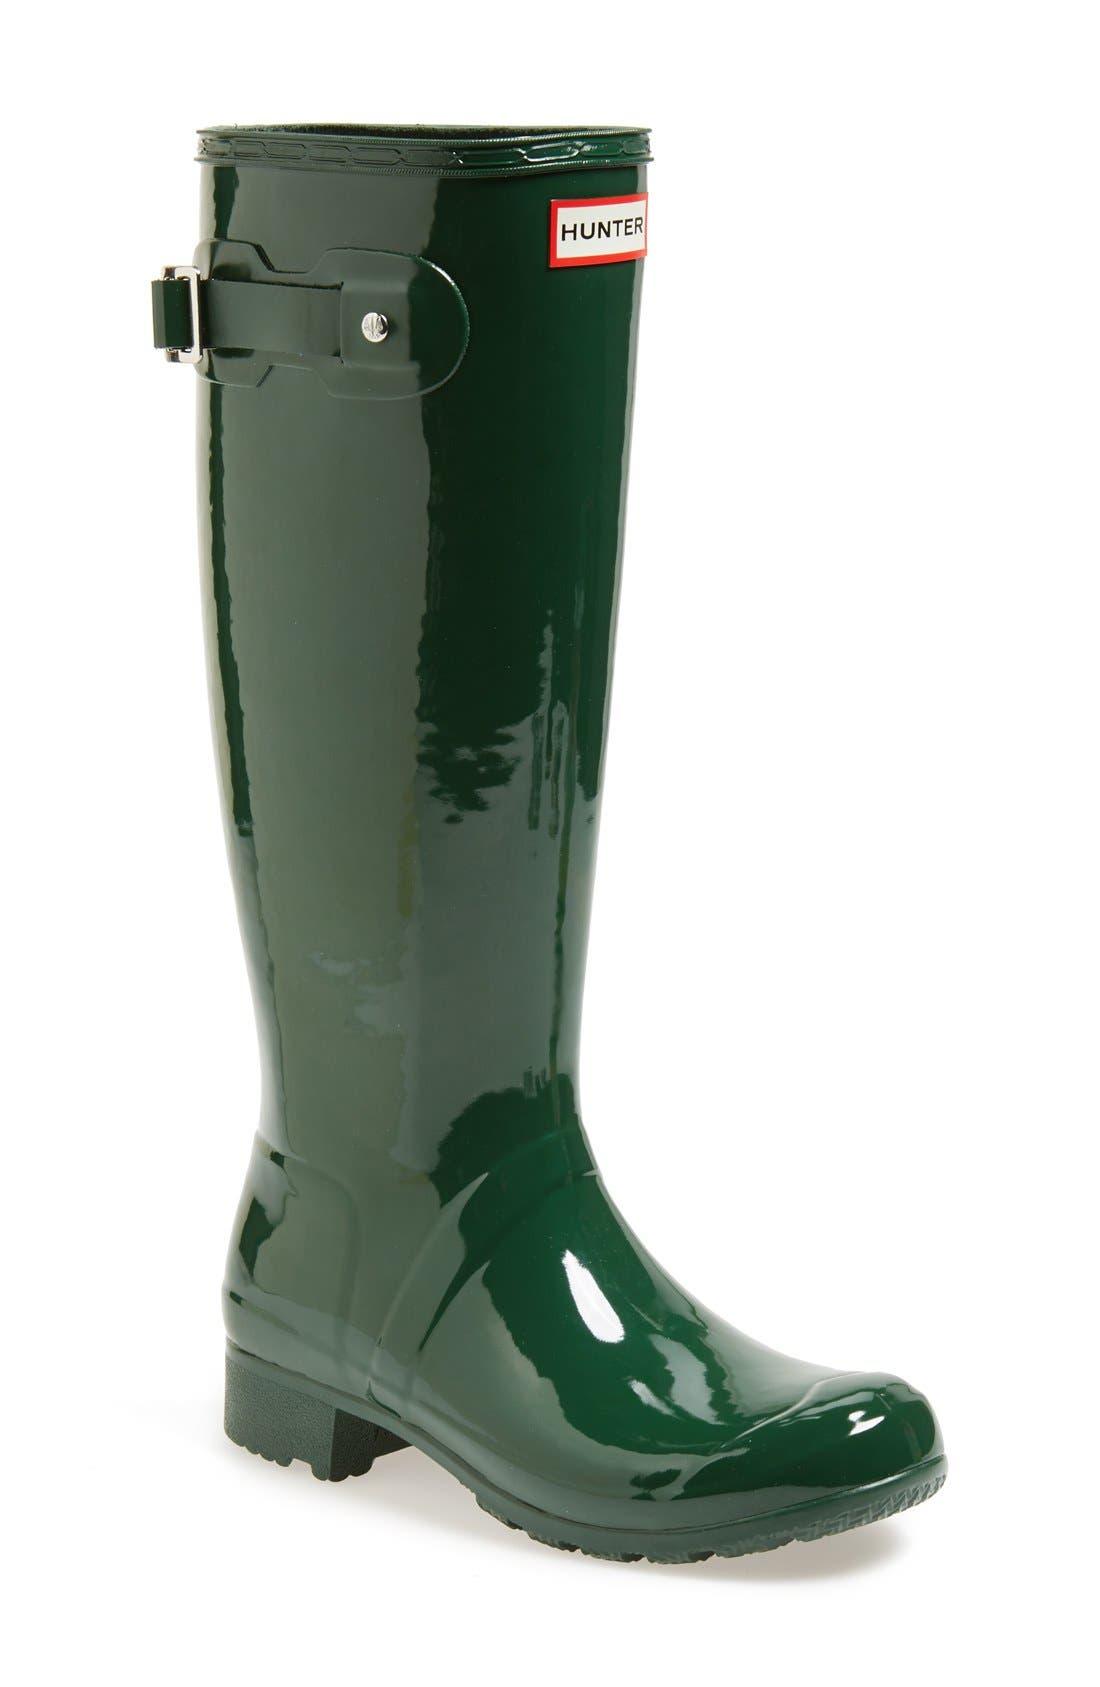 Main Image - Hunter Original Tour Gloss Packable Rain Boot (Women)